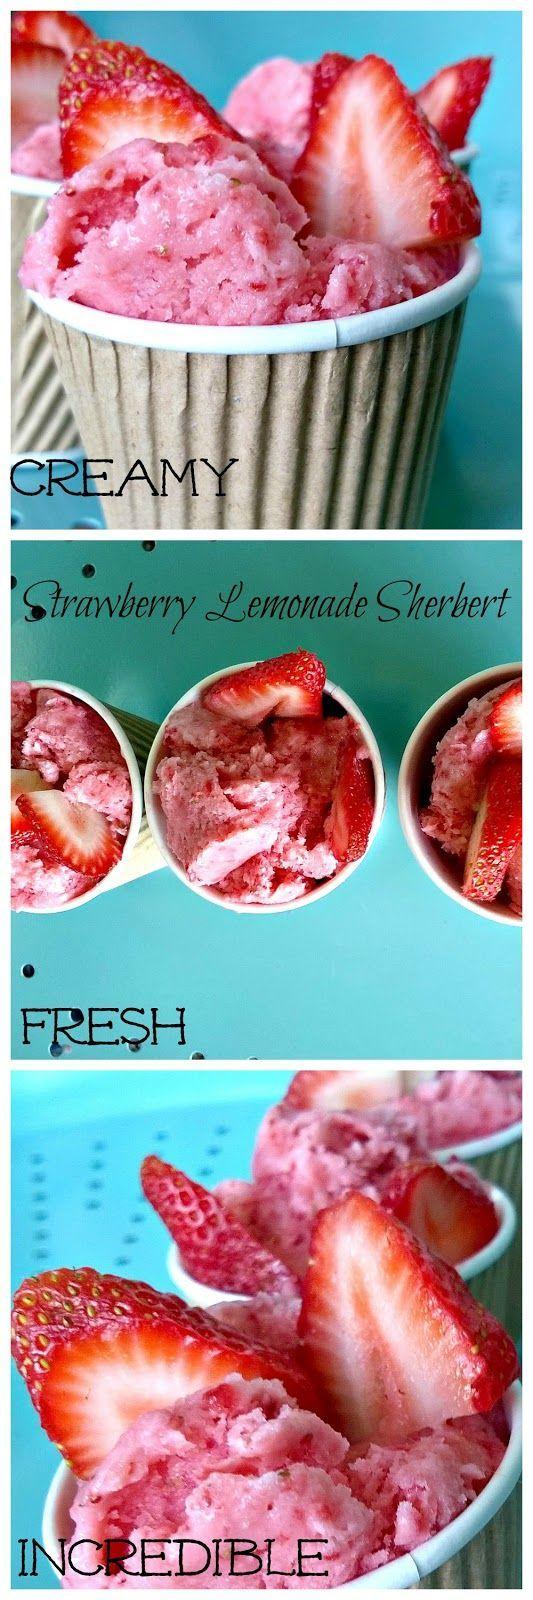 Strawberry Lemonade Sherbet! #strawberry #lemonade #sherbet #recipe #dessert #treat #snack #quick #easy #creamy #icecream (scheduled via http://www.tailwindapp.com?utm_source=pinterest&utm_medium=twpin&utm_content=post62476668&utm_campaign=scheduler_attribution)